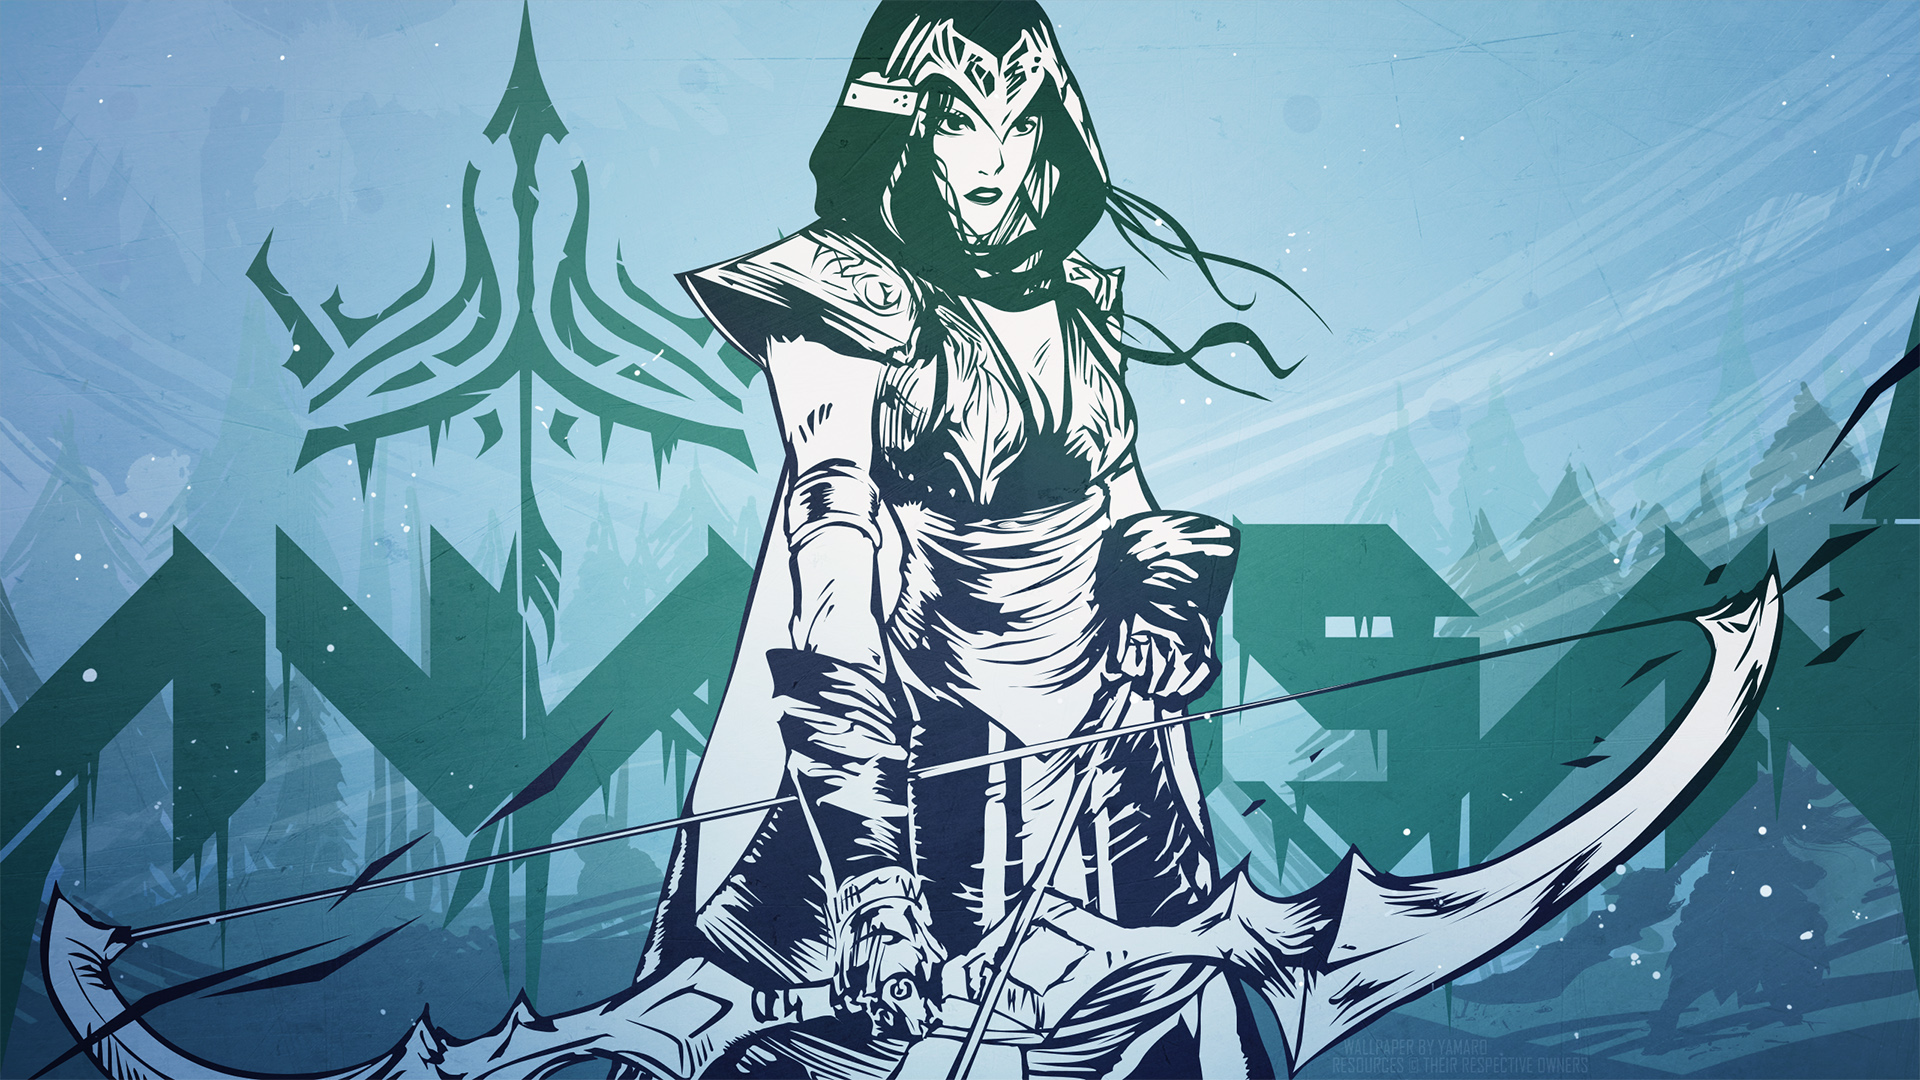 League of Legends wallpaper 72